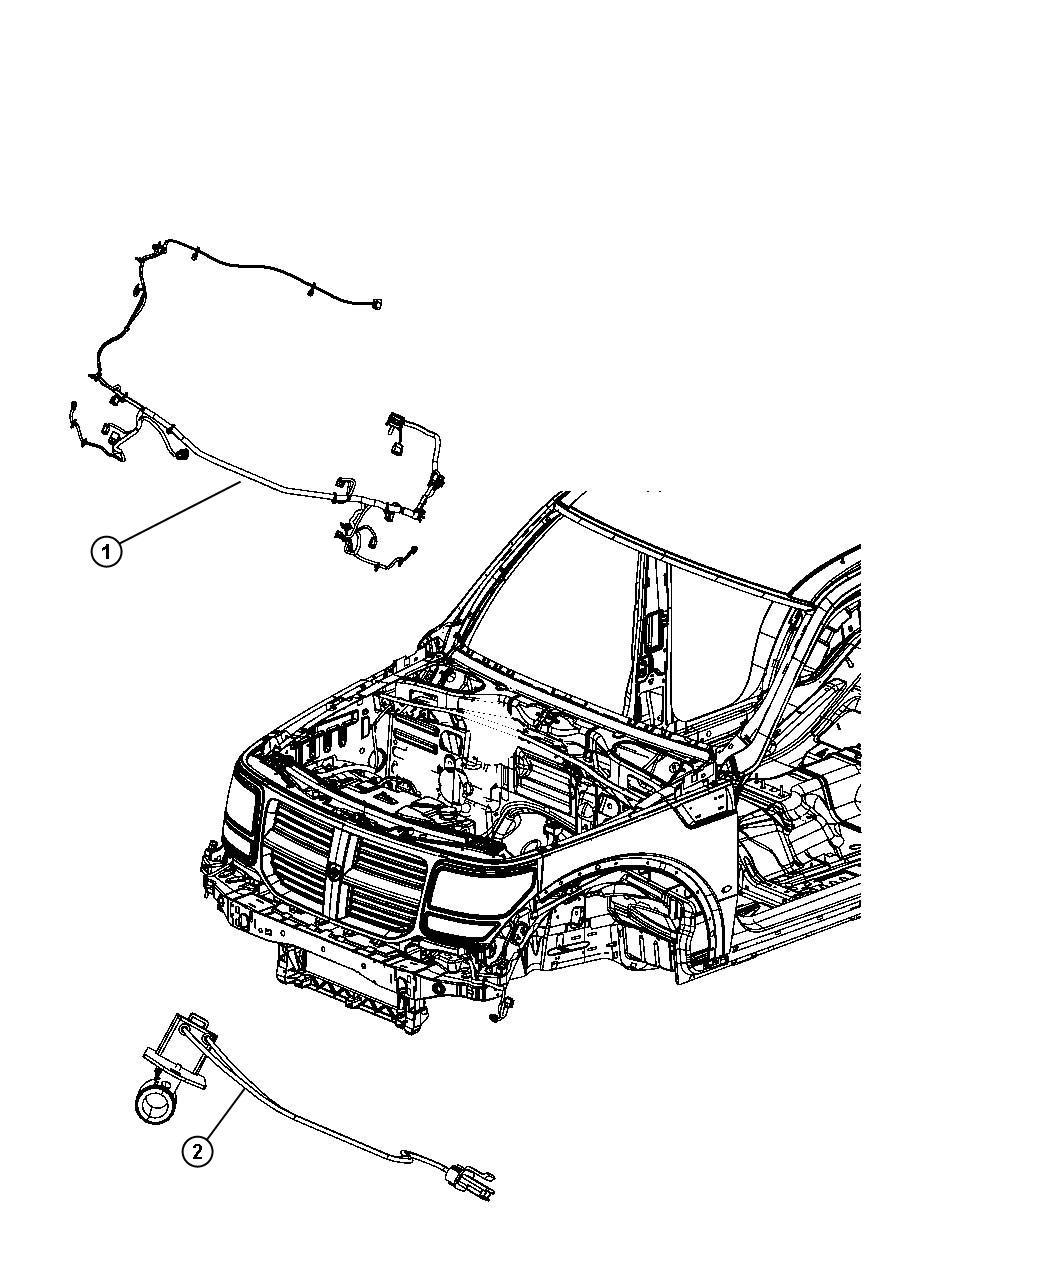 2008 Dodge Nitro Wiring  Front End Lighting  Export